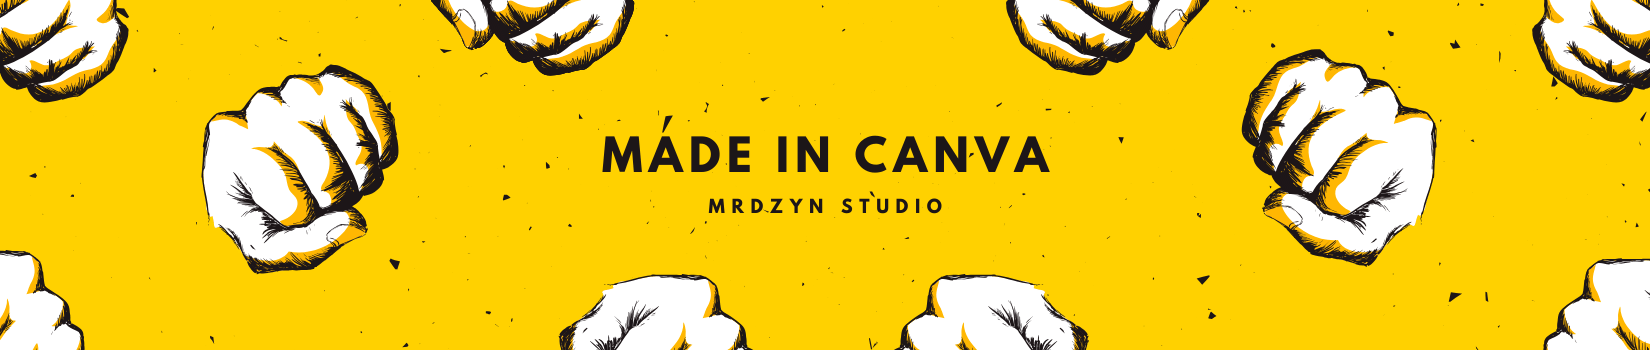 Mrdzyn Studio Shop